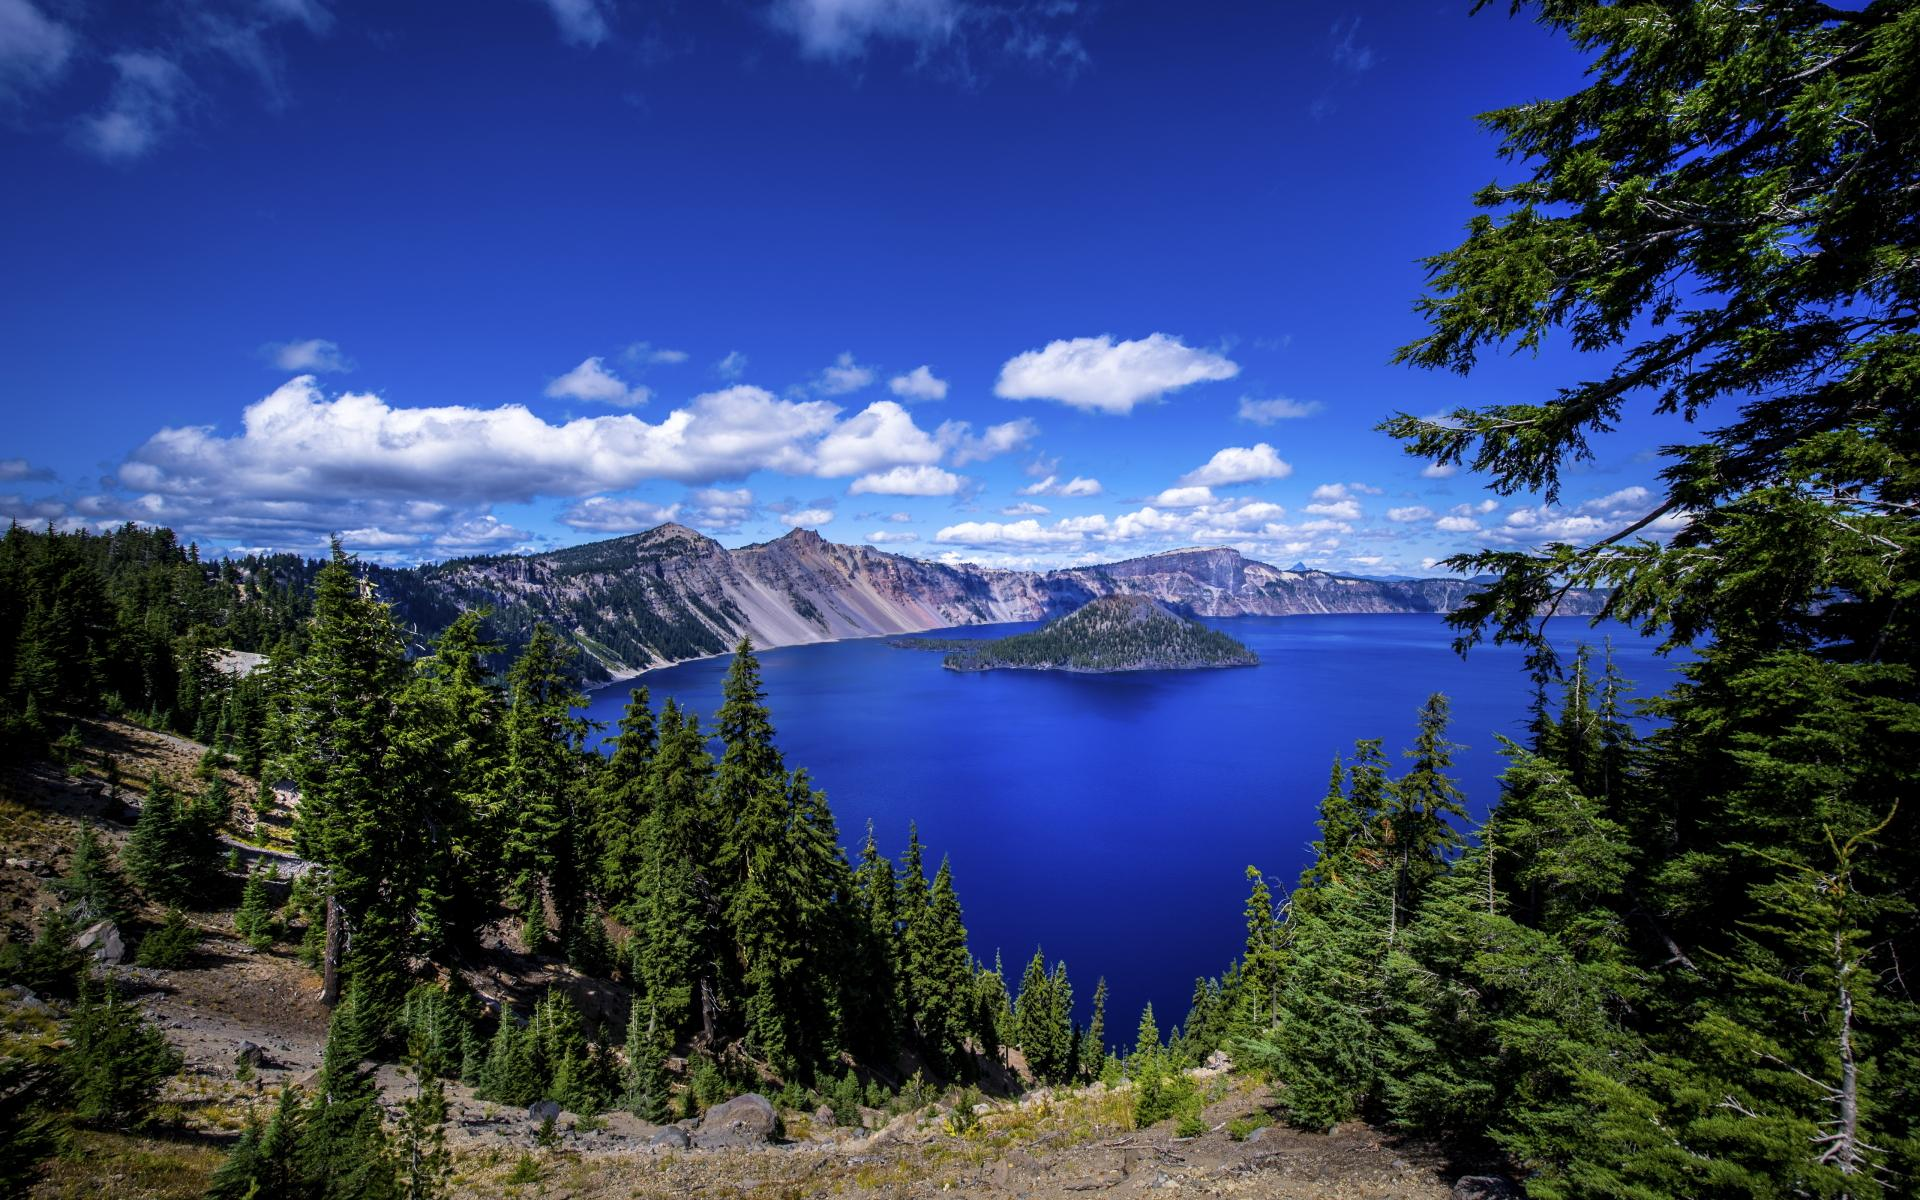 Oregon Wallpapers Hd: Crater Lake Wallpaper HD Download